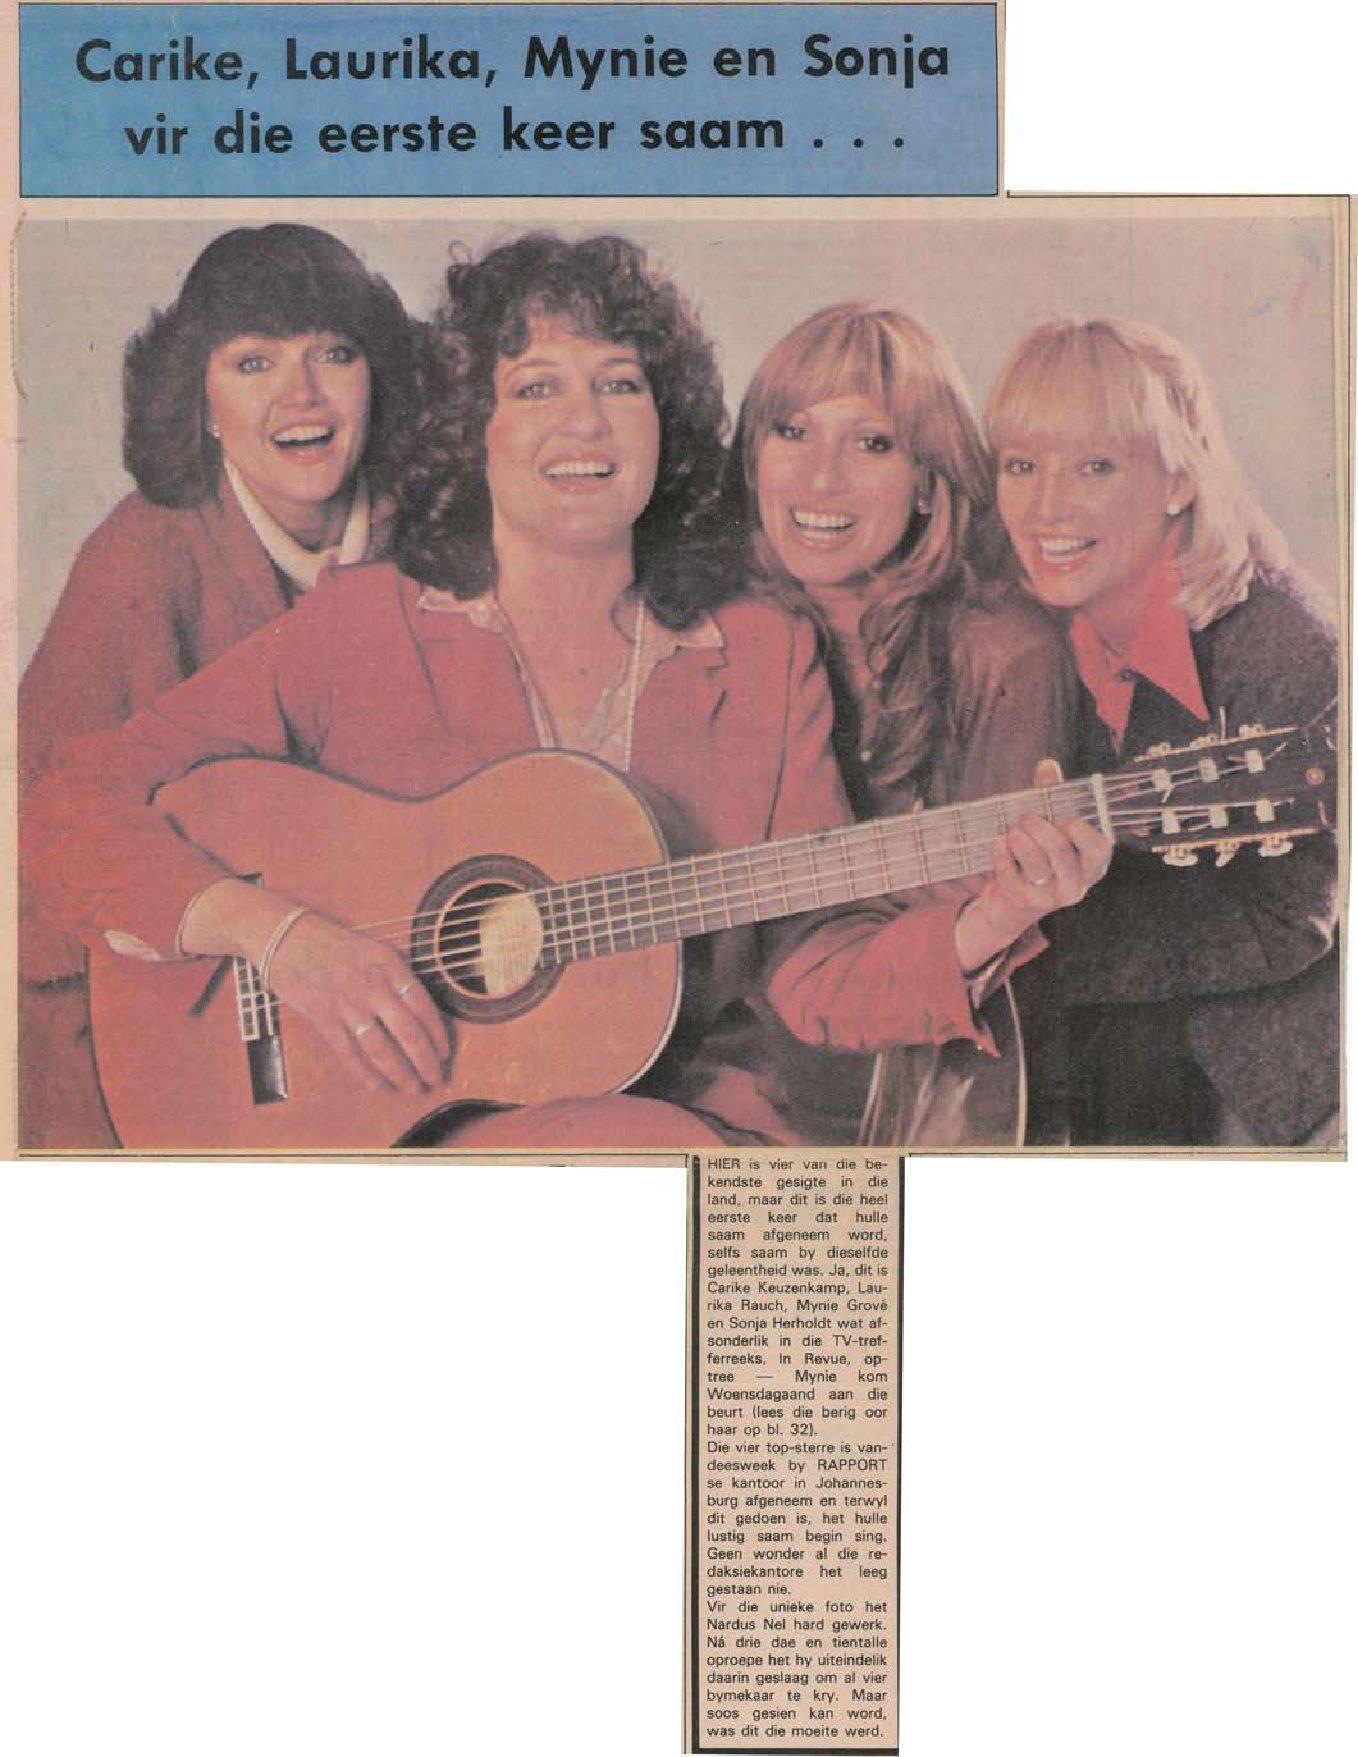 1981-rapport-carike-laurika-mynie-sonja